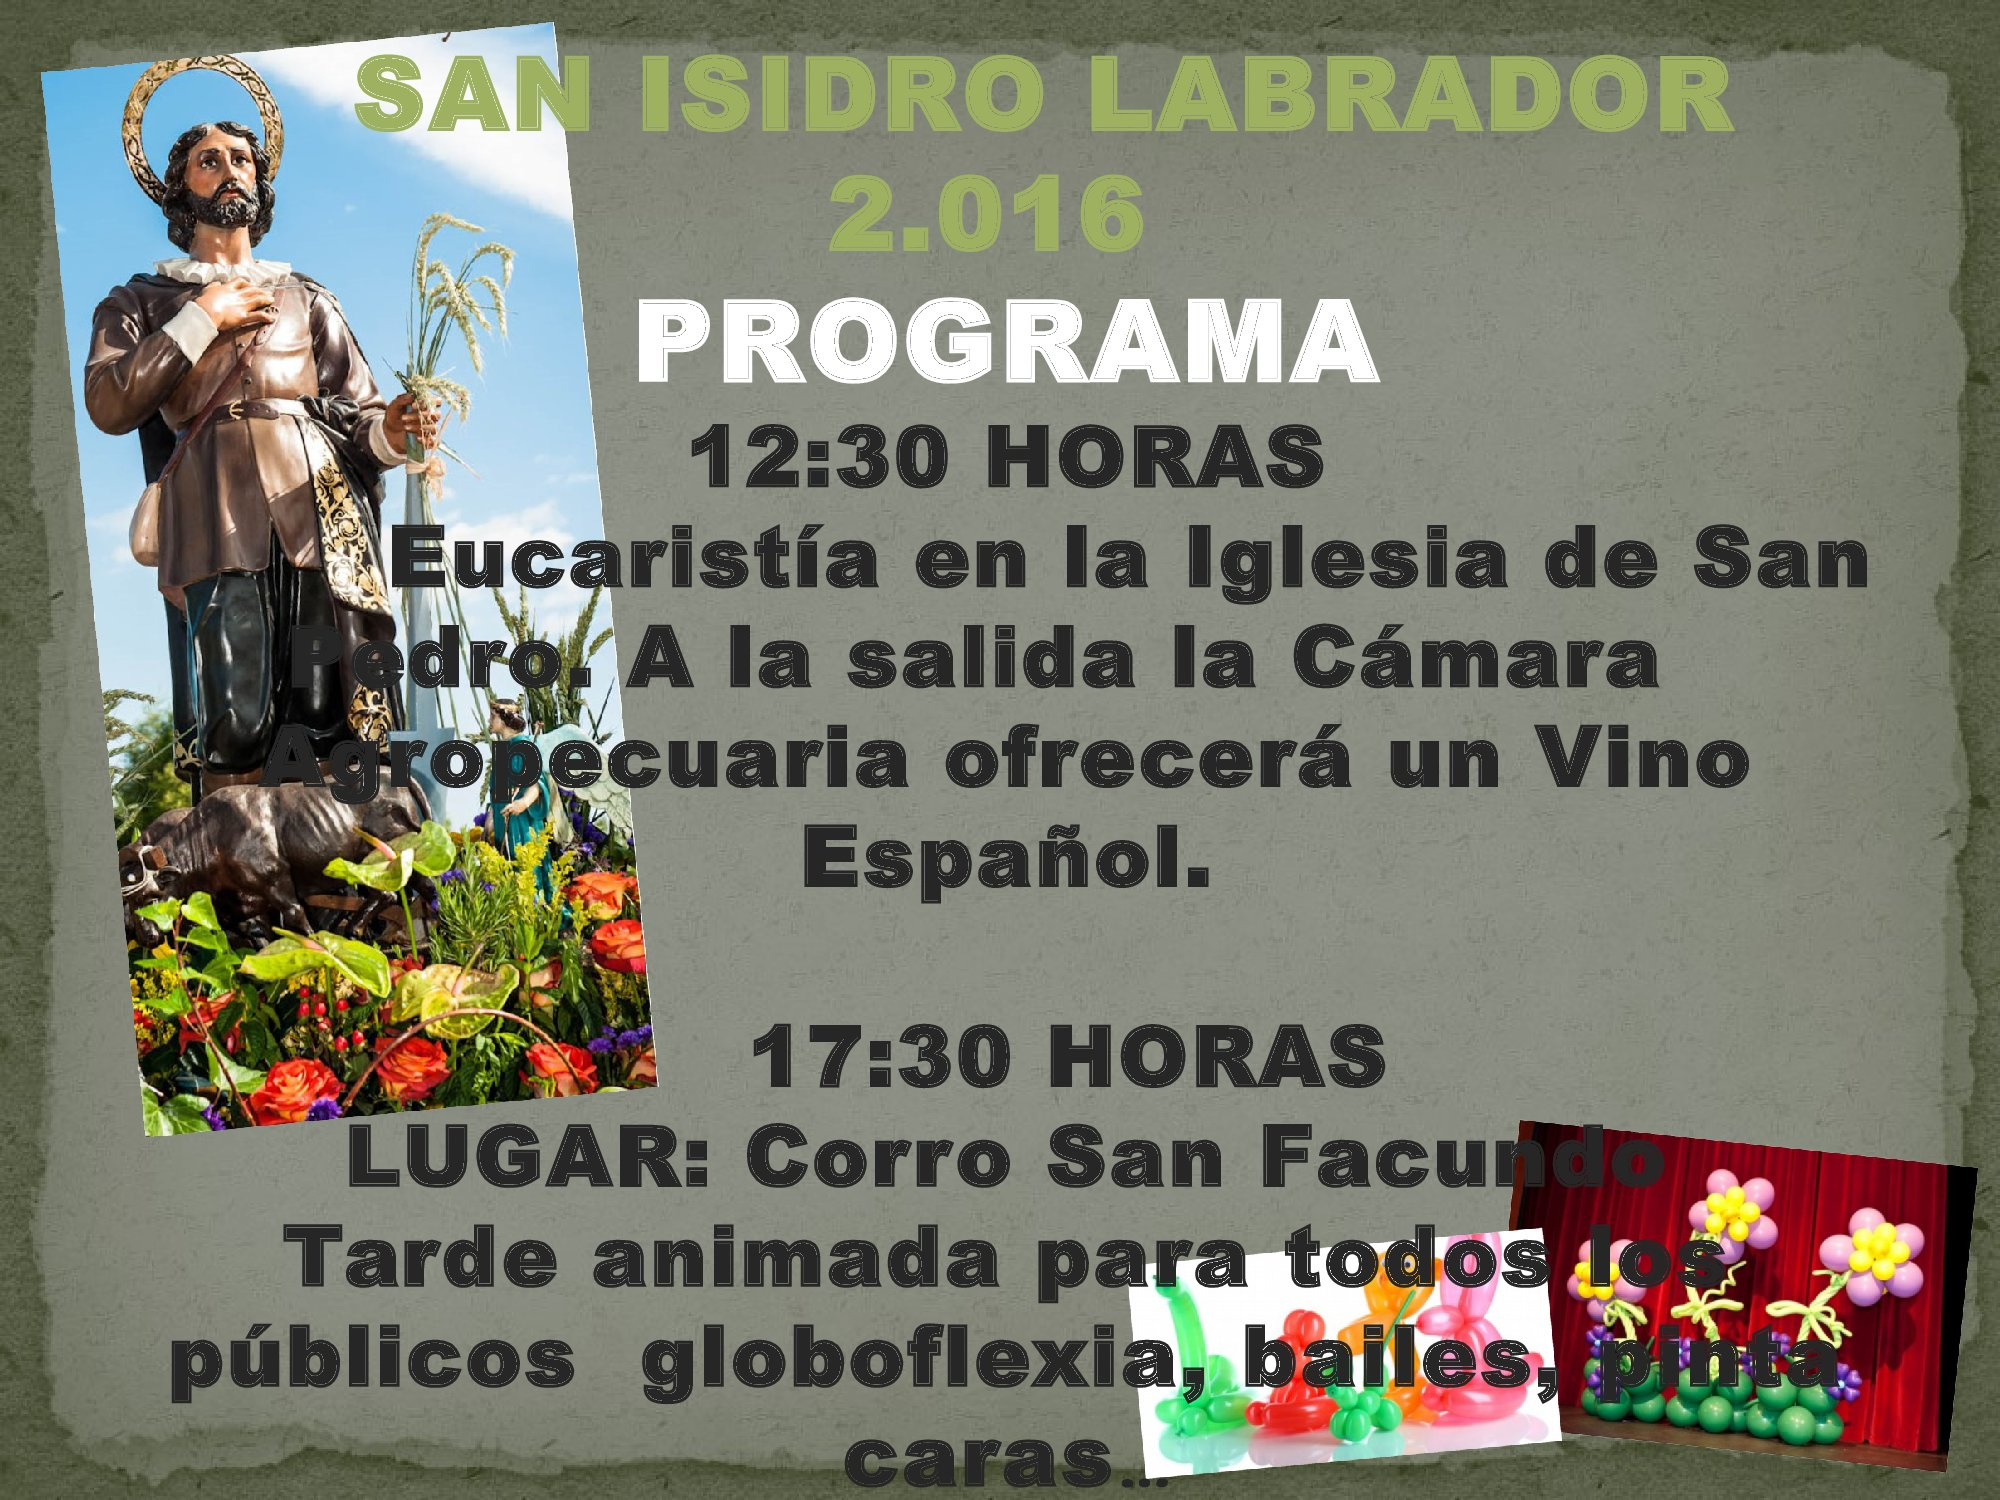 SAN ISIDRO LABRADOR 2.016